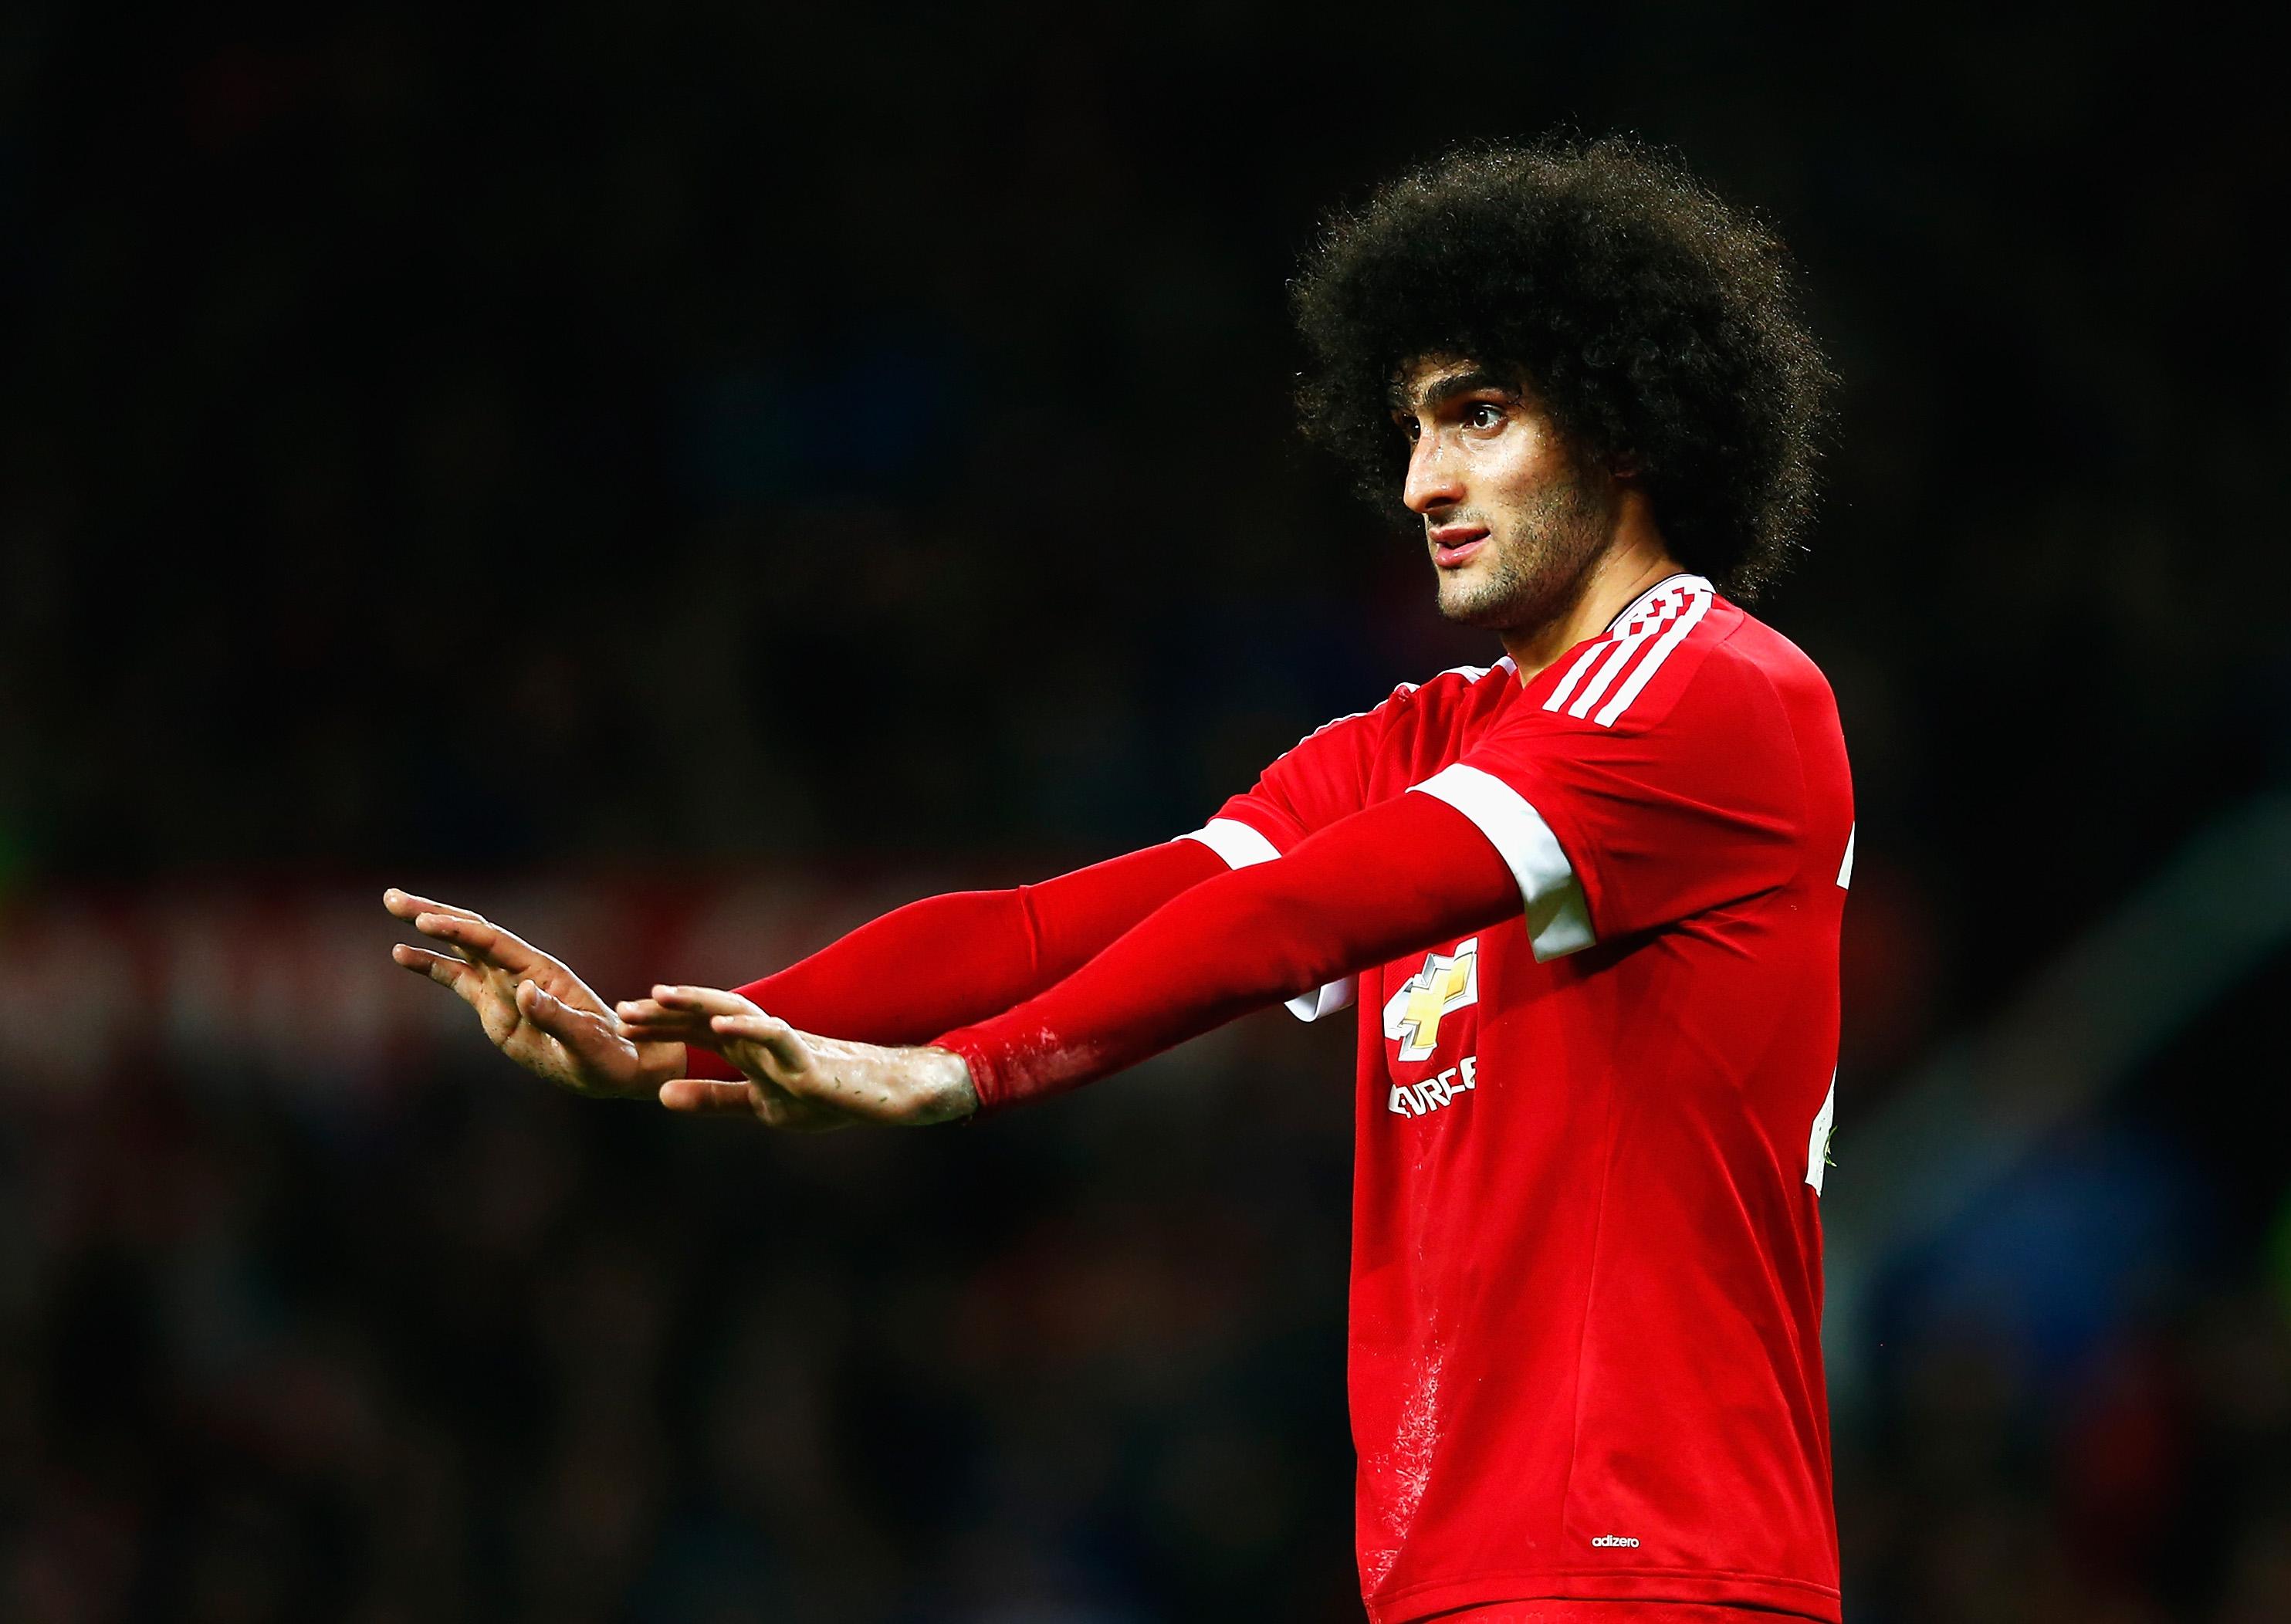 Marouane Fellaini, Manchester United